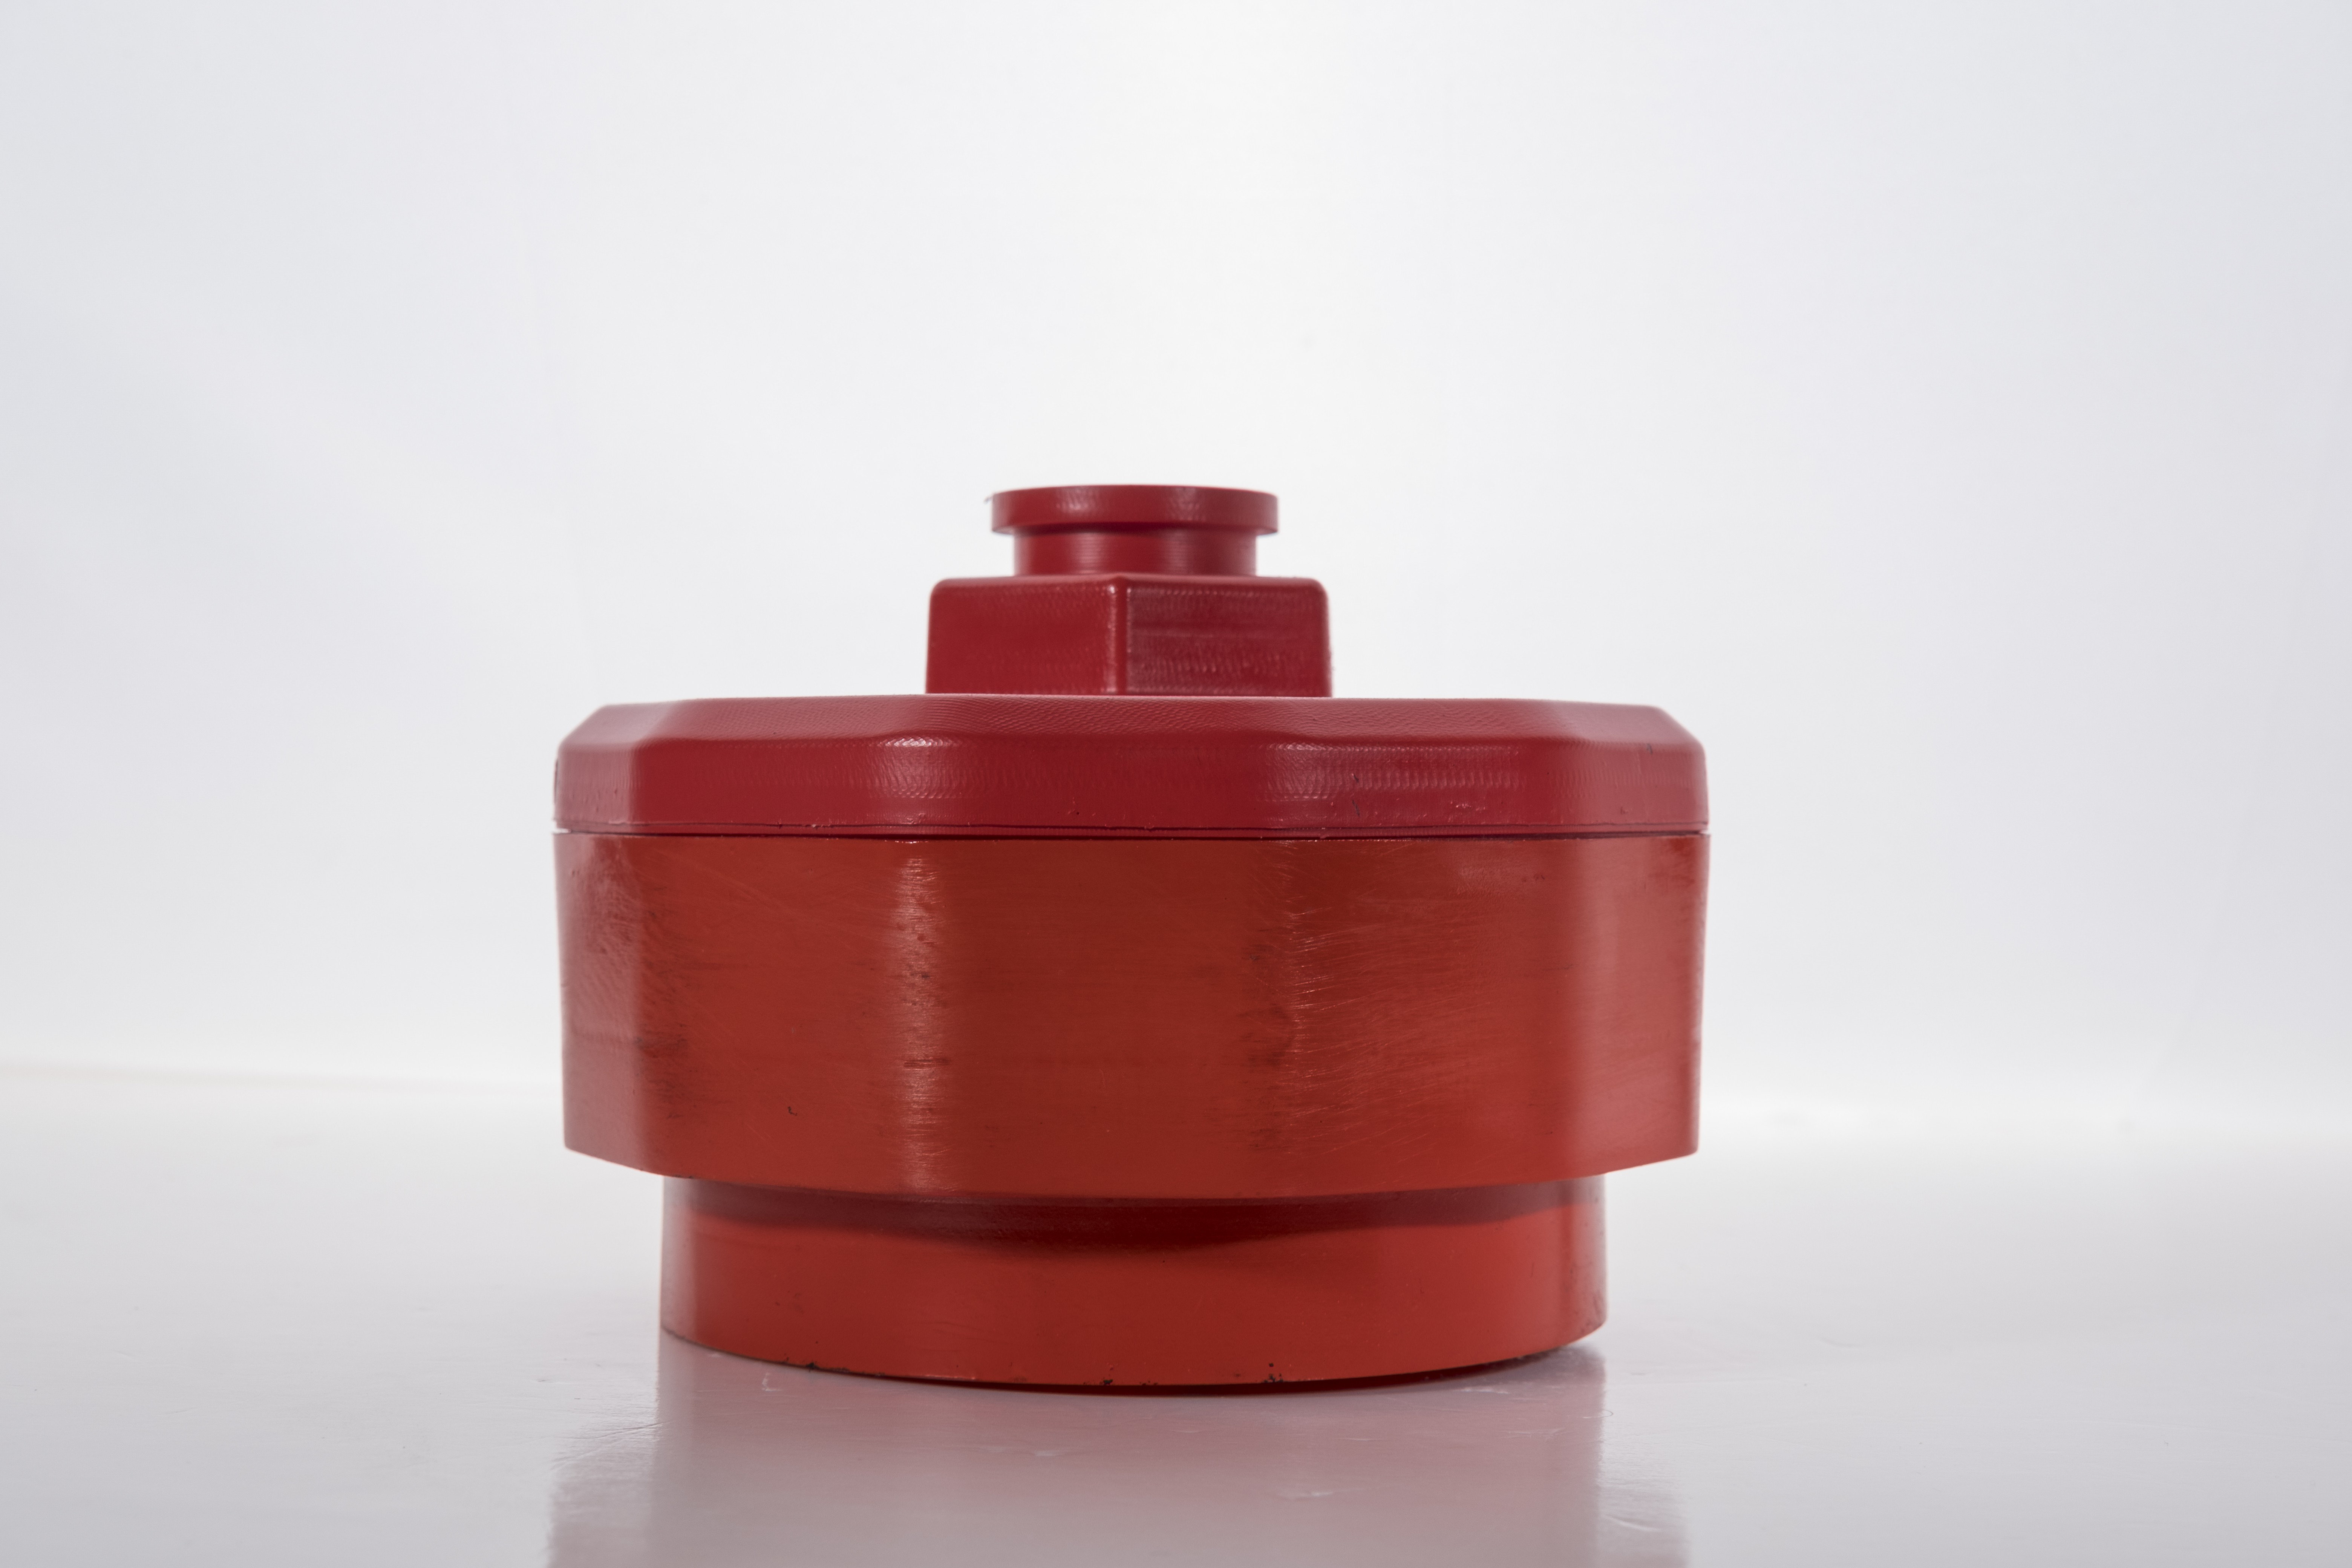 TSM-02H智能闷盖消防栓监测终端